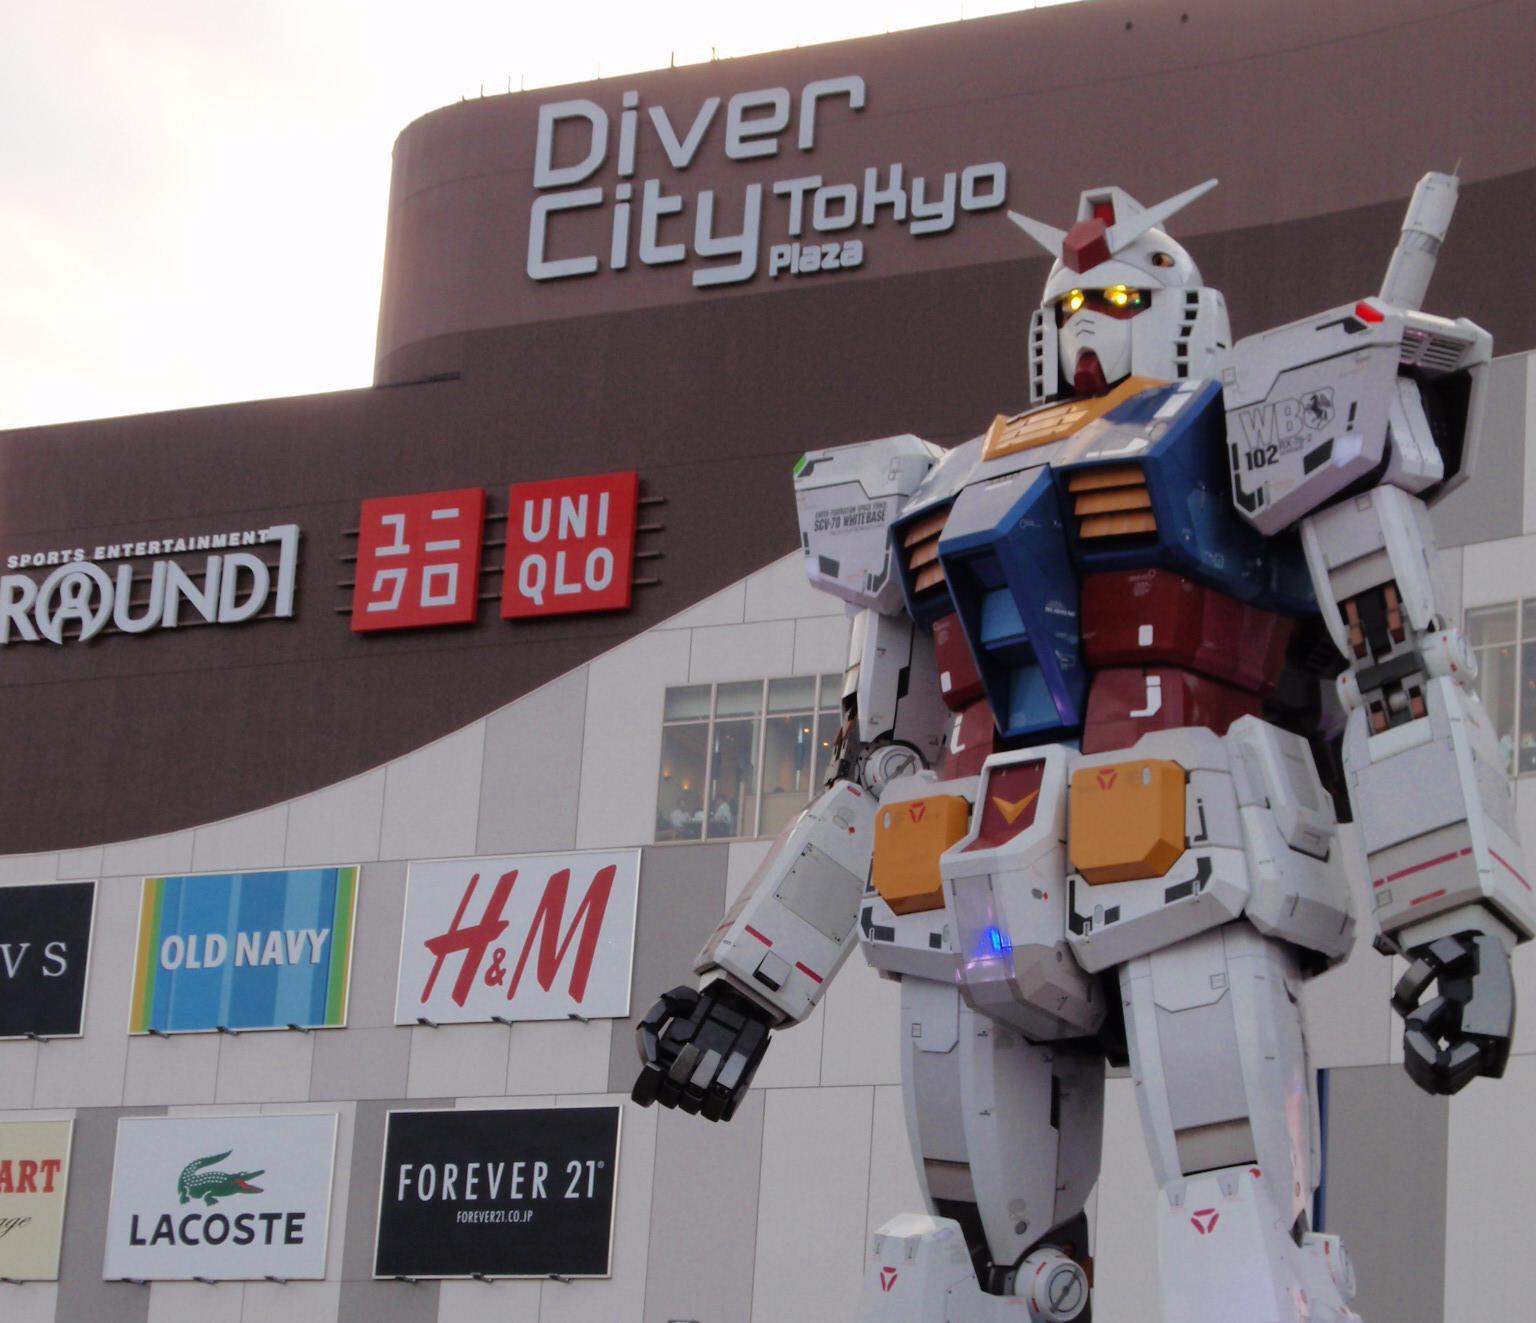 Diver City Tokyo Diver City Tokyo Plaza